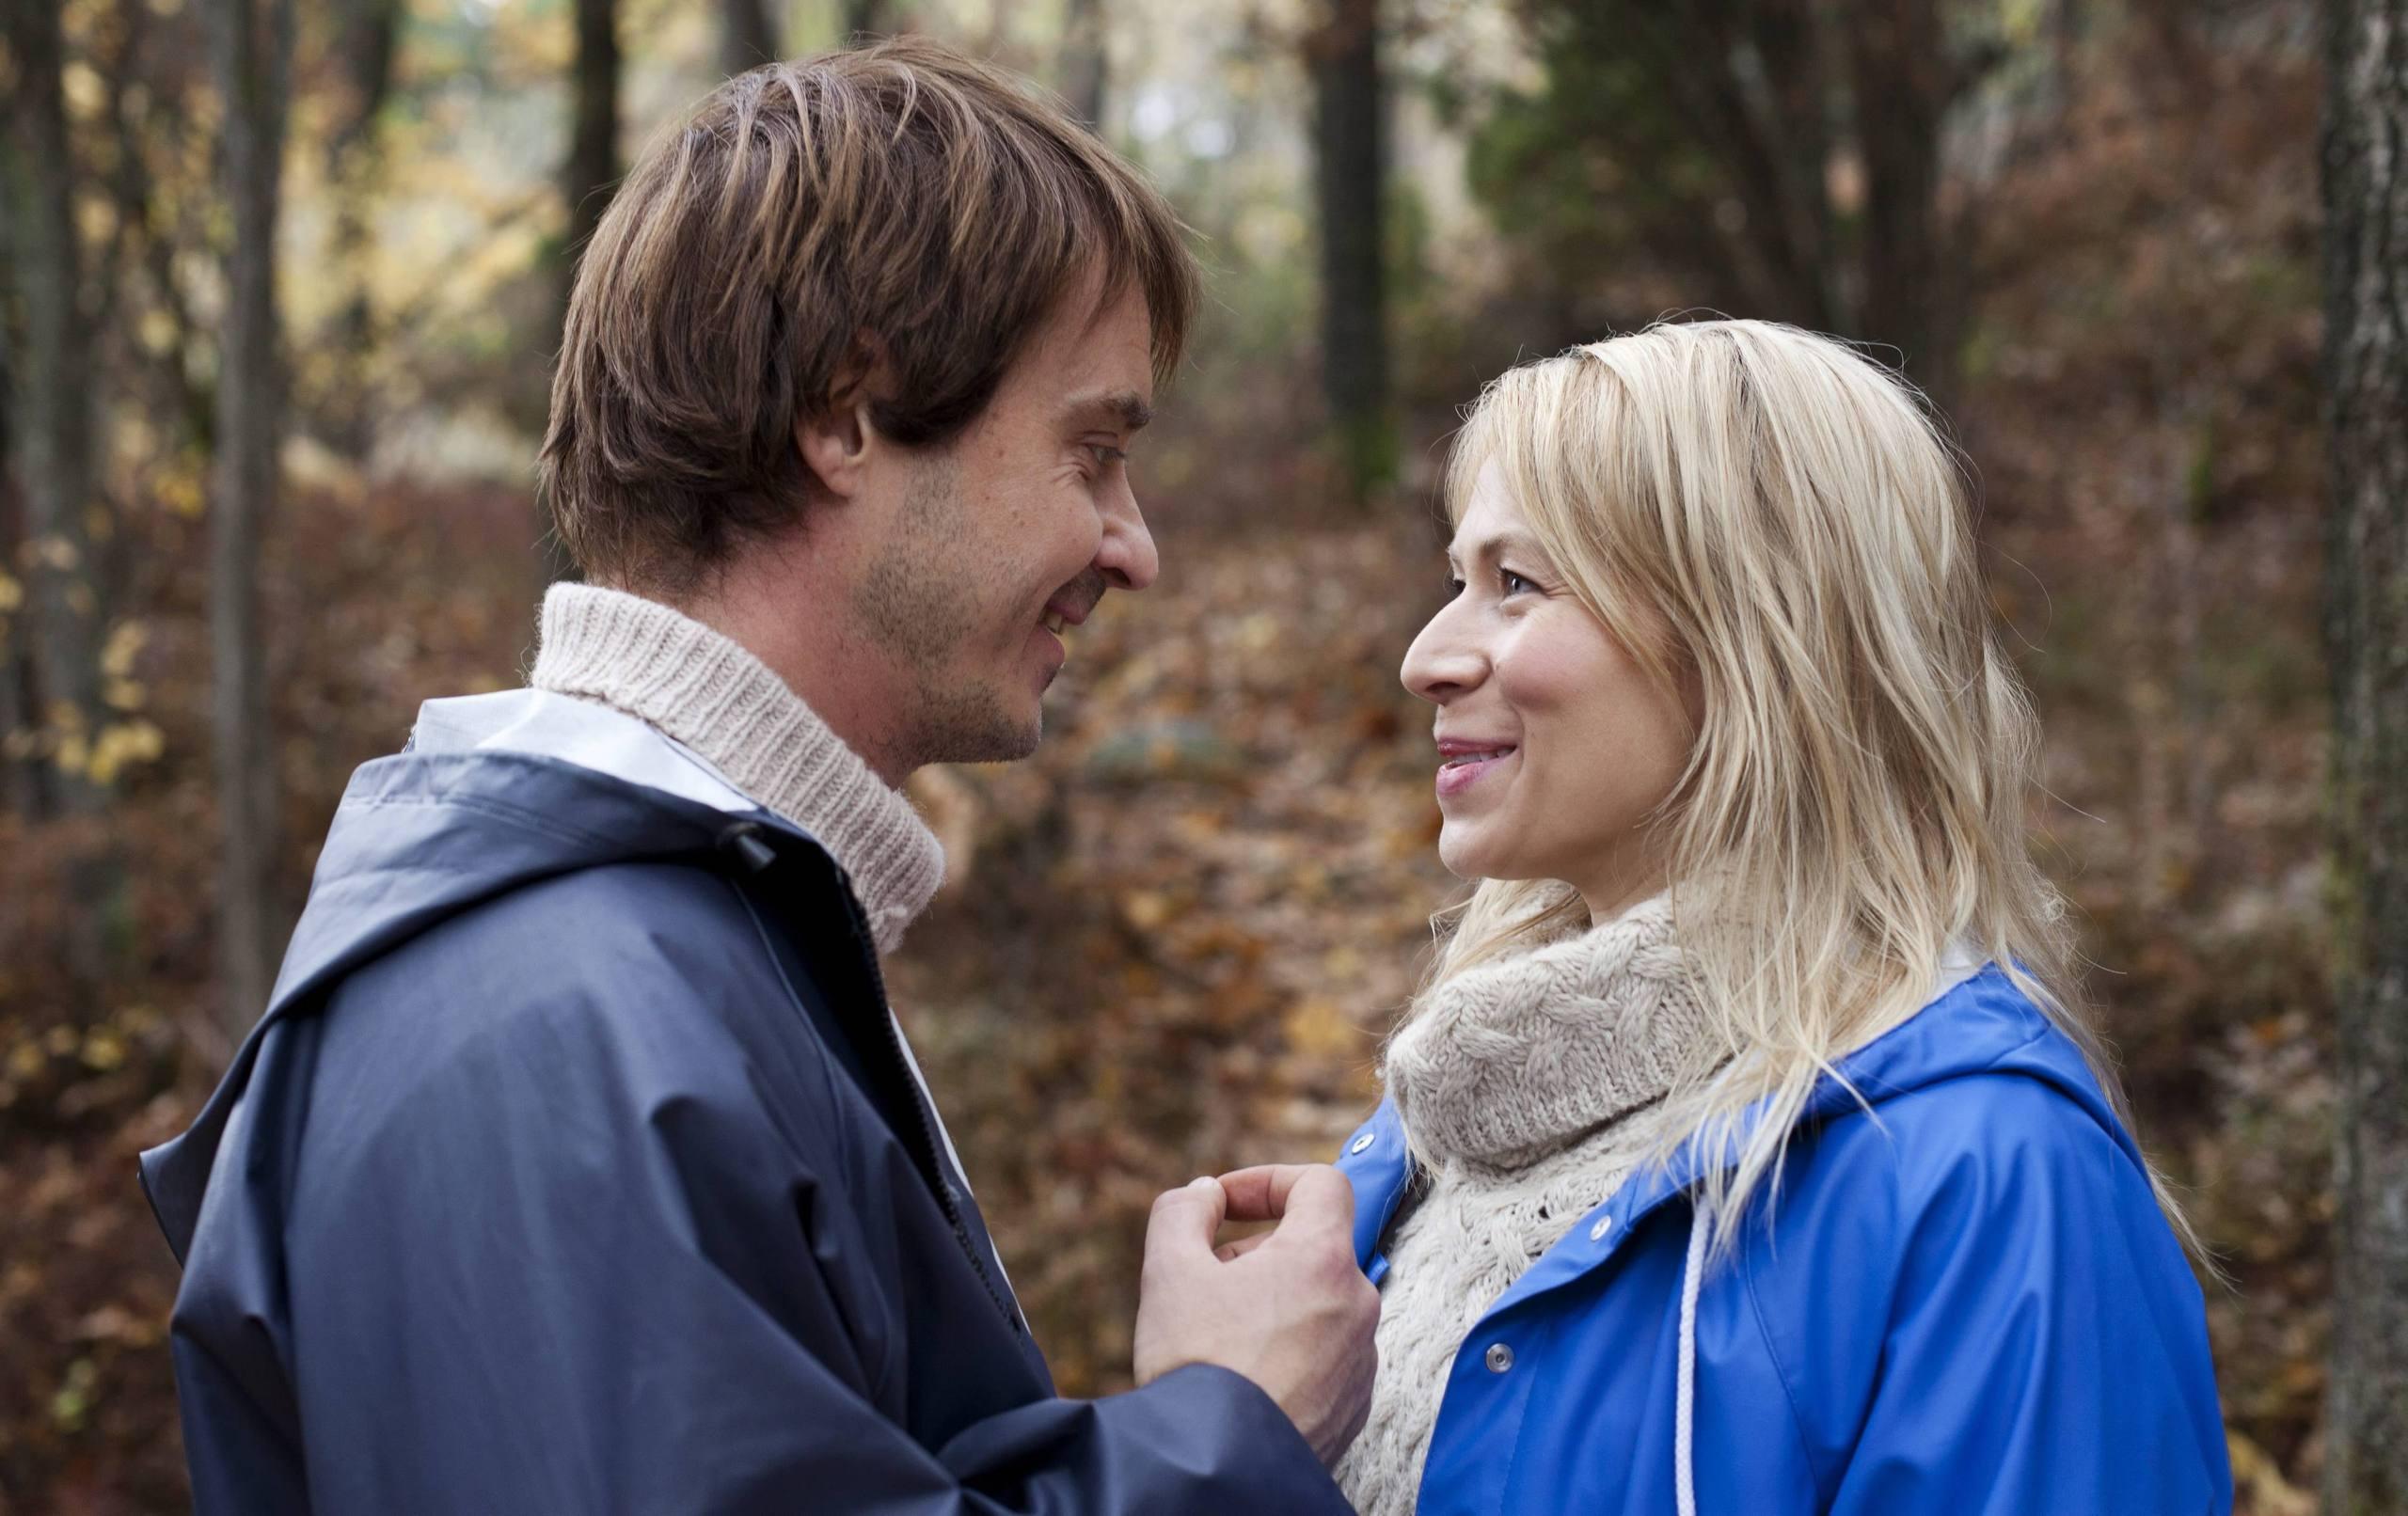 Vad betyder uteslutande dating betyder